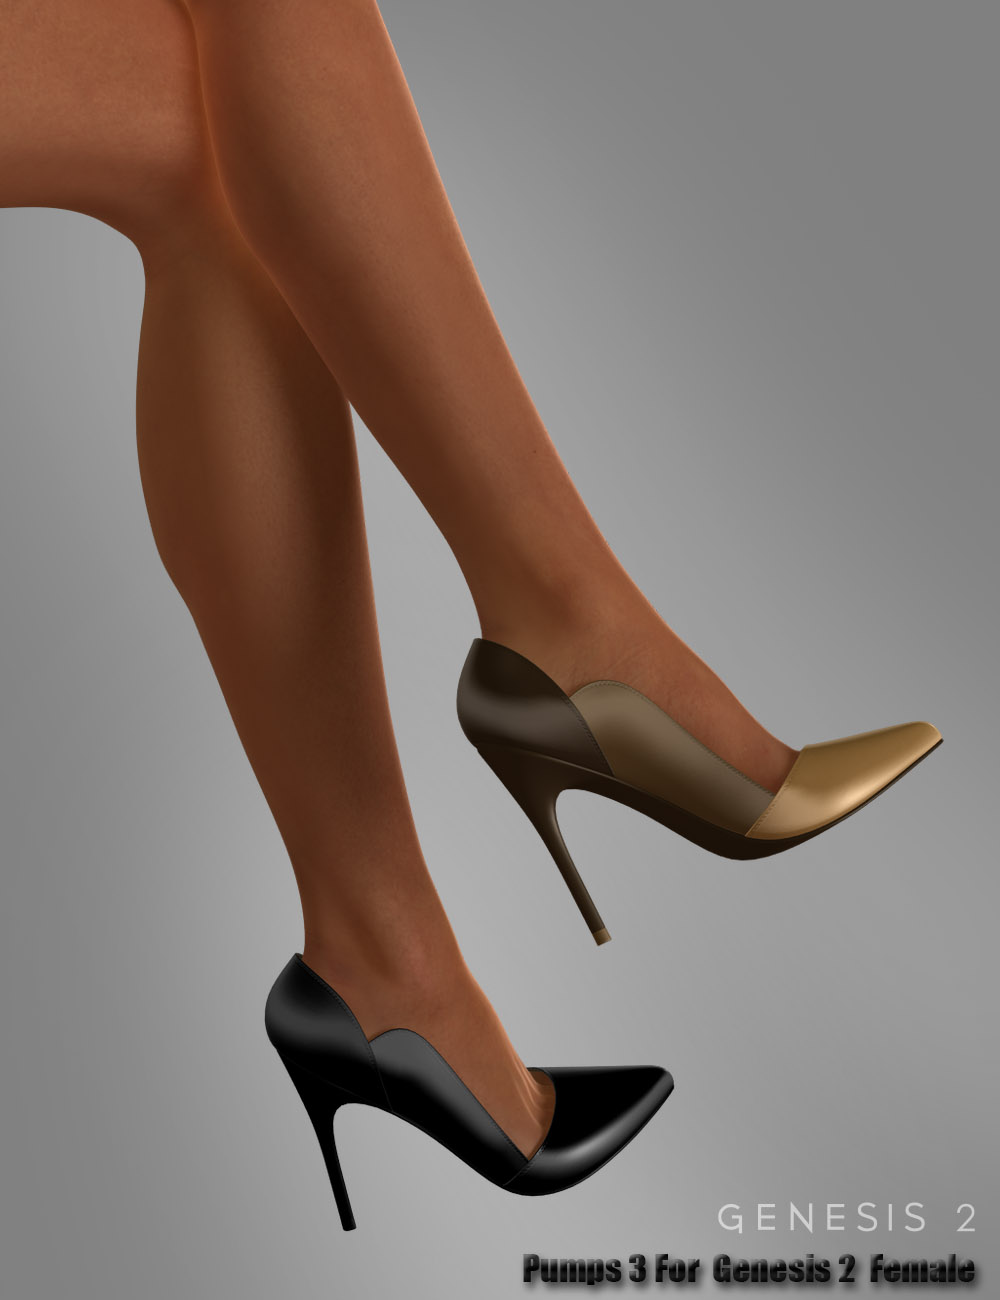 Pumps 3 for Genesis 2 Female(s) by: dx30, 3D Models by Daz 3D